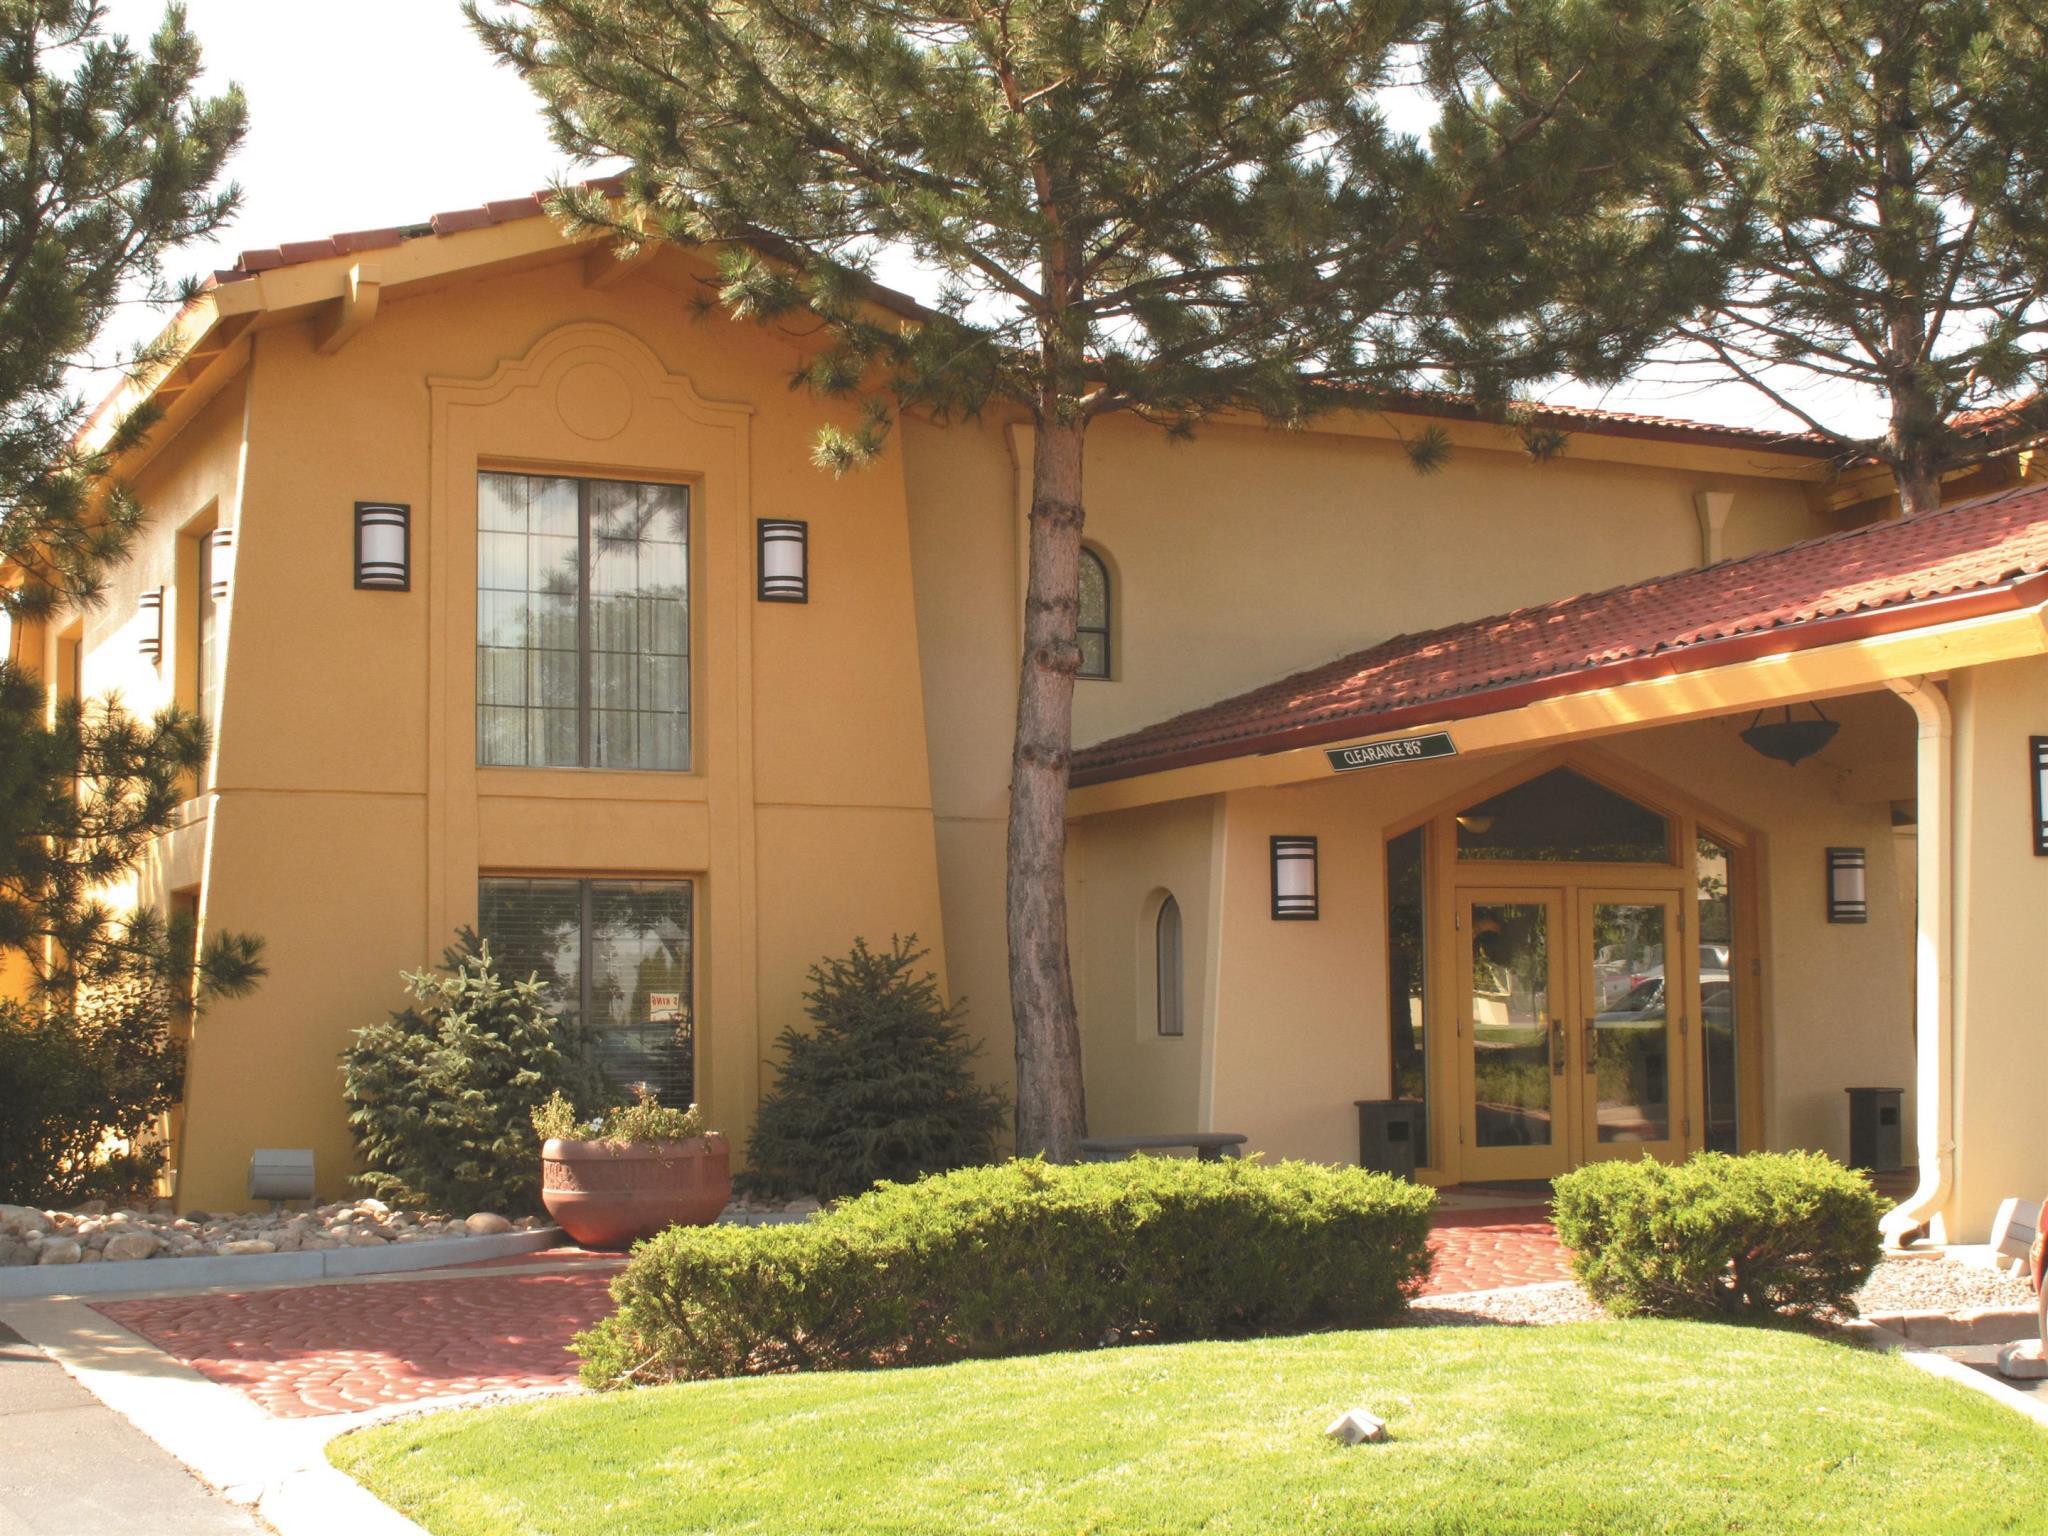 Quality Inn, Arapahoe